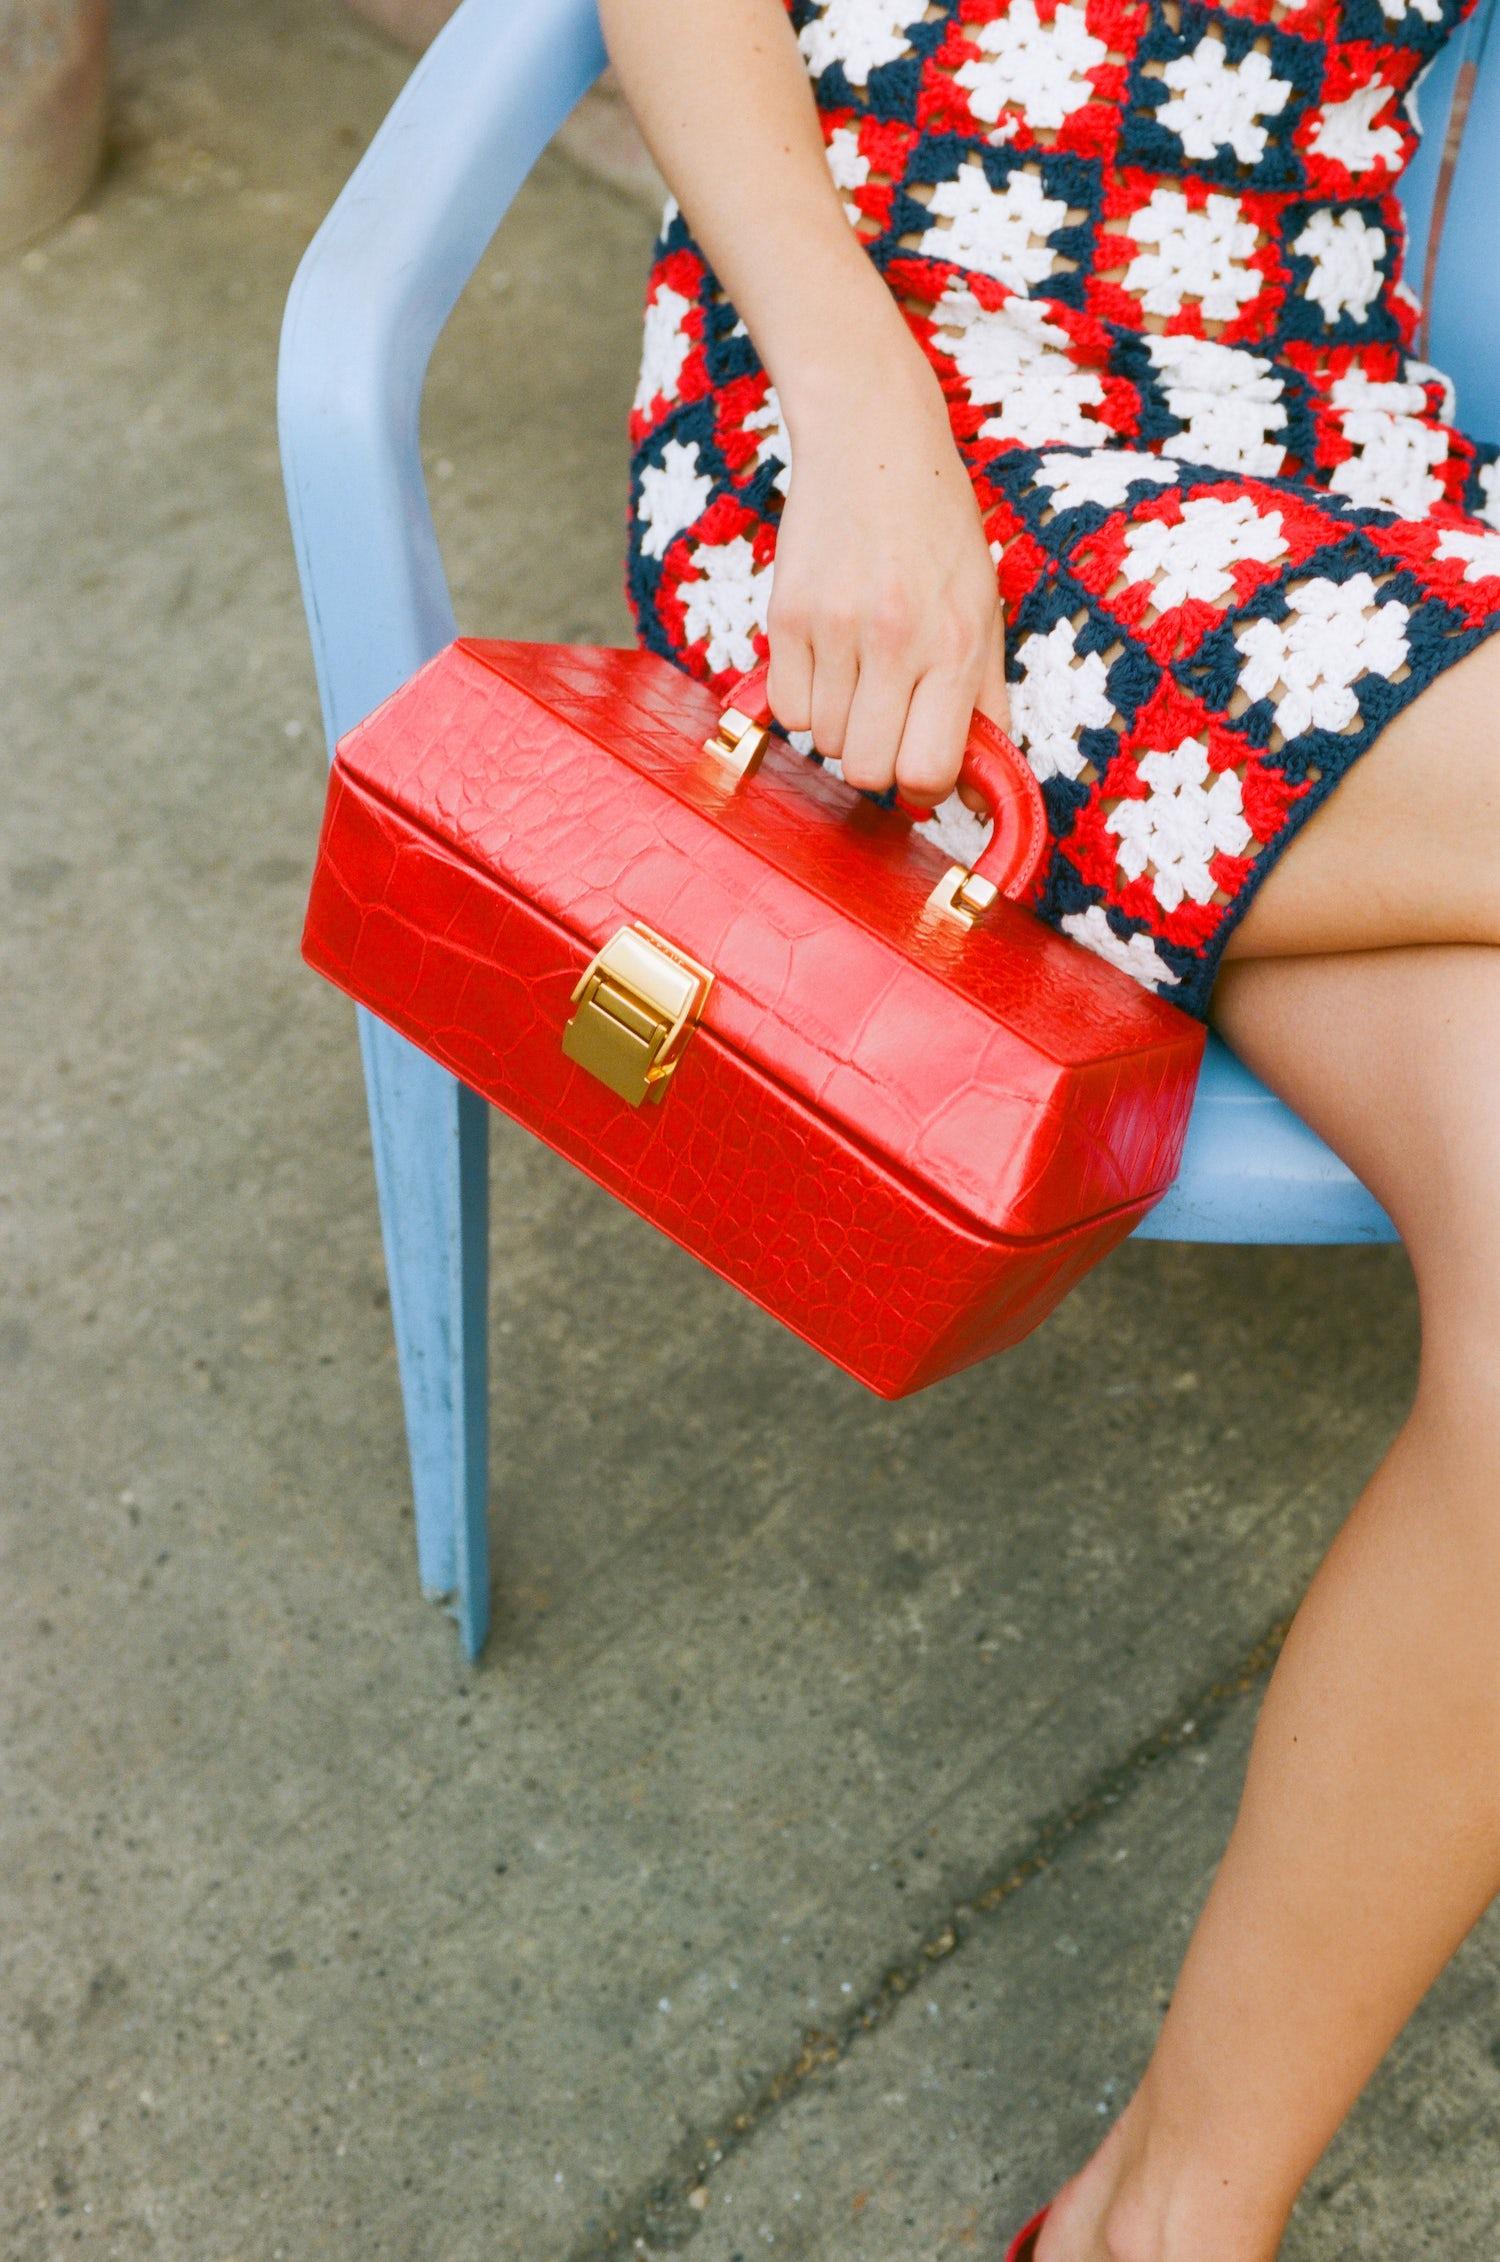 An exclusive handbag by Staud